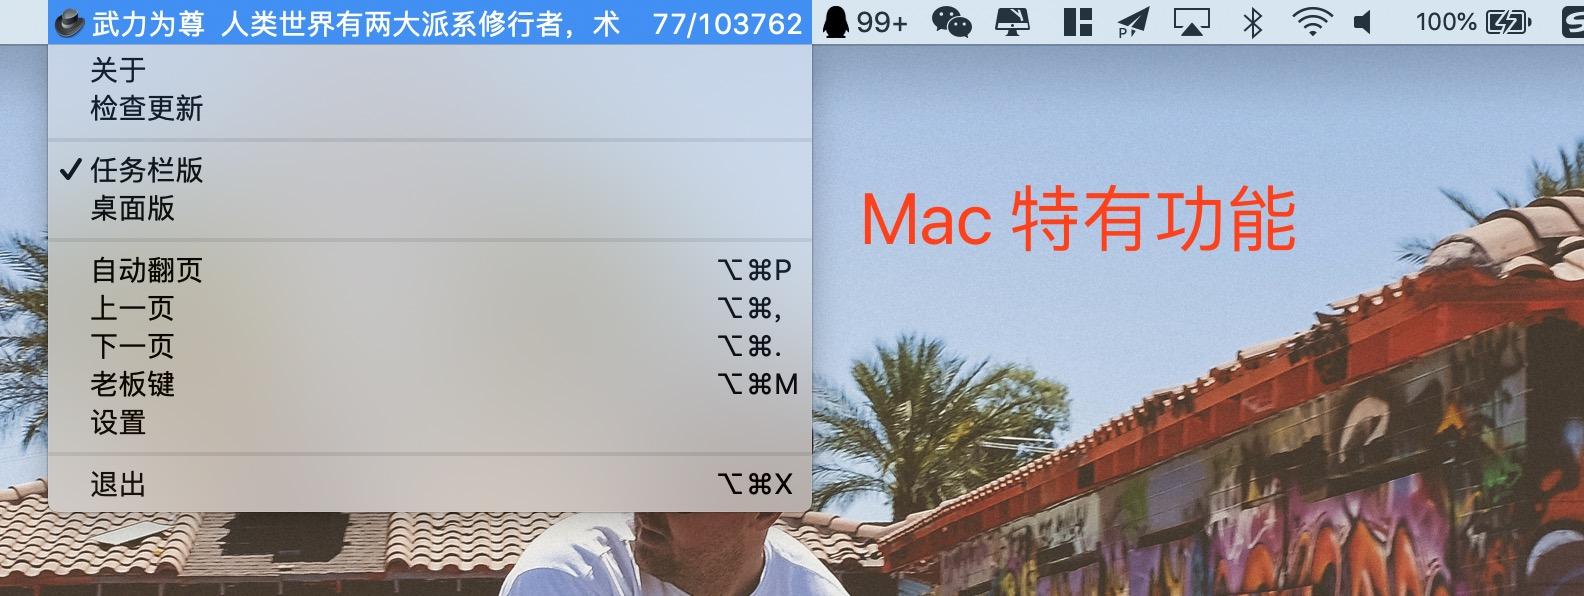 Thief-Book - 上班摸鱼神器:在屏幕小区域上阅读小说[Win/macOS/VS Code] 2